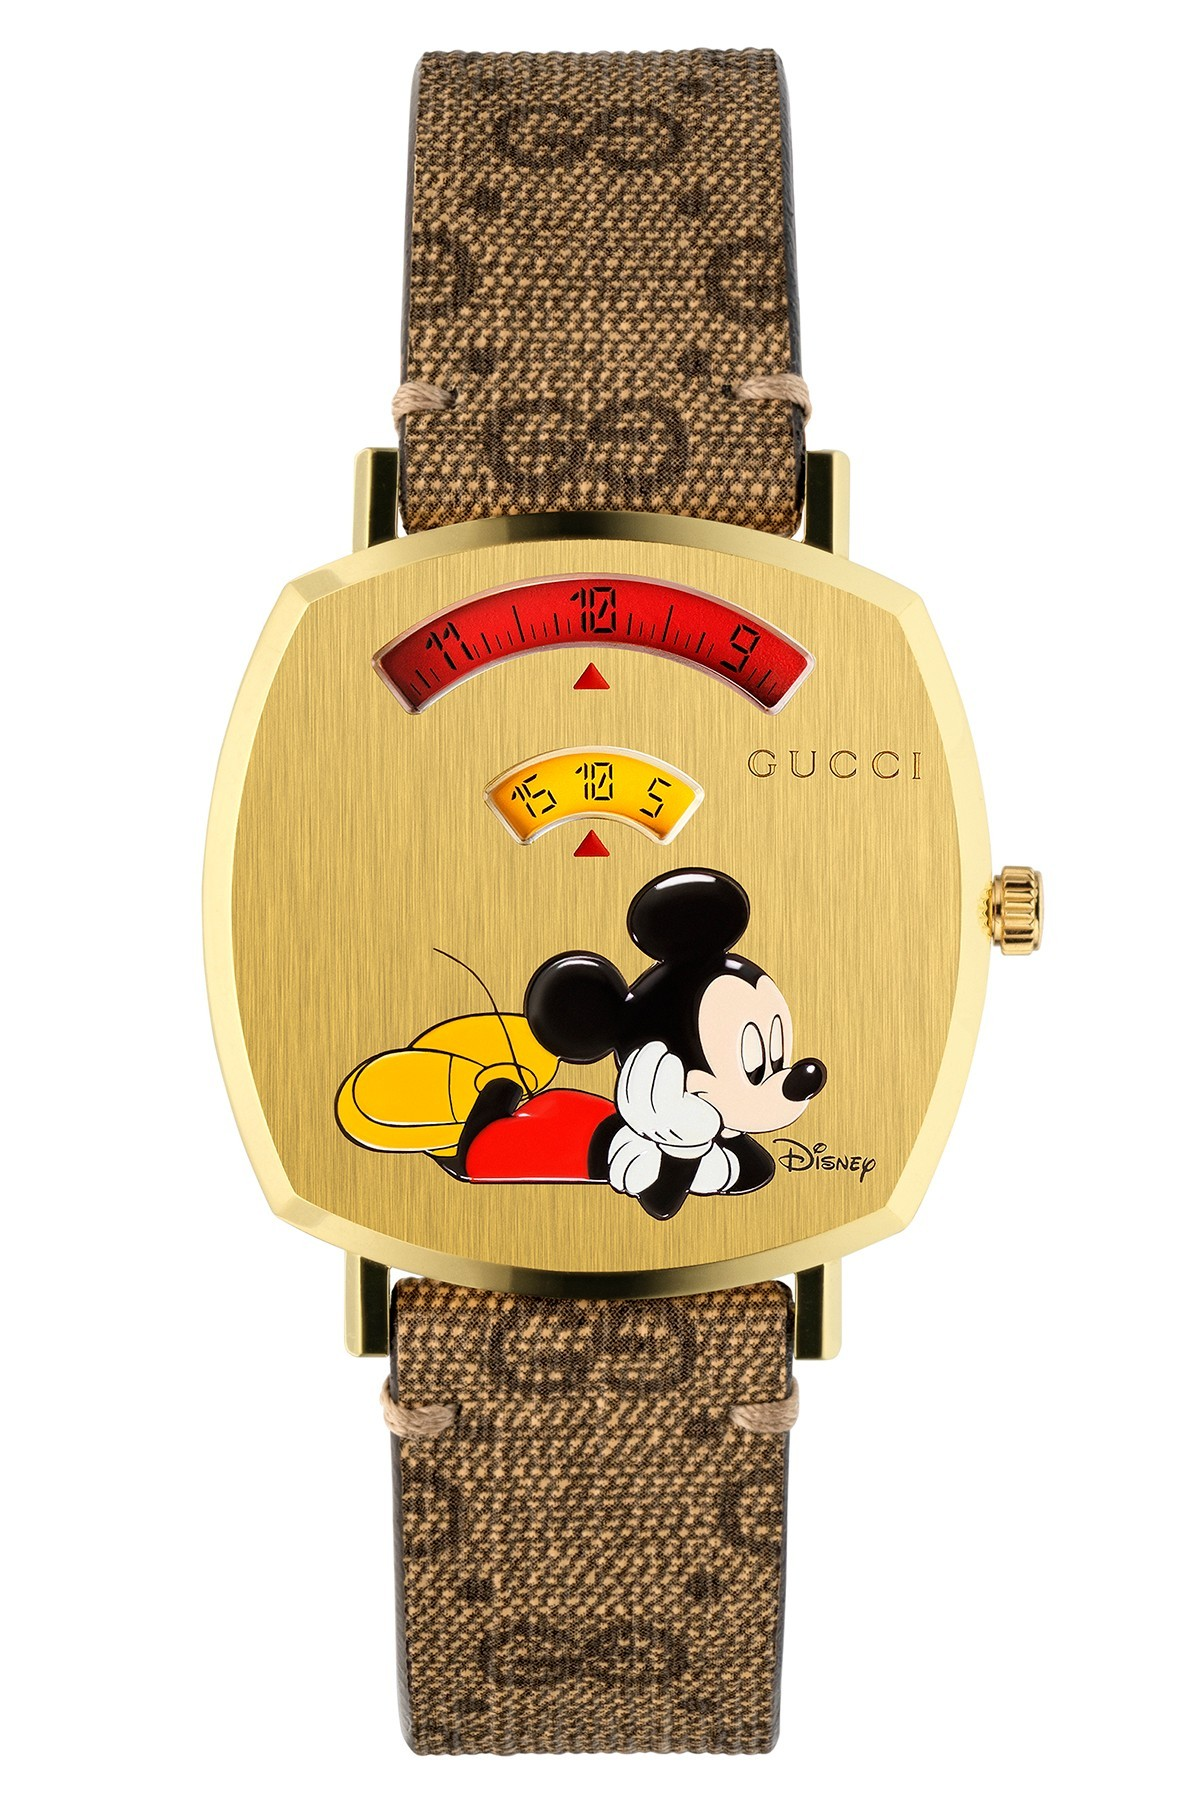 Disney x Gucci Mickey Mouse Grip Watch Info